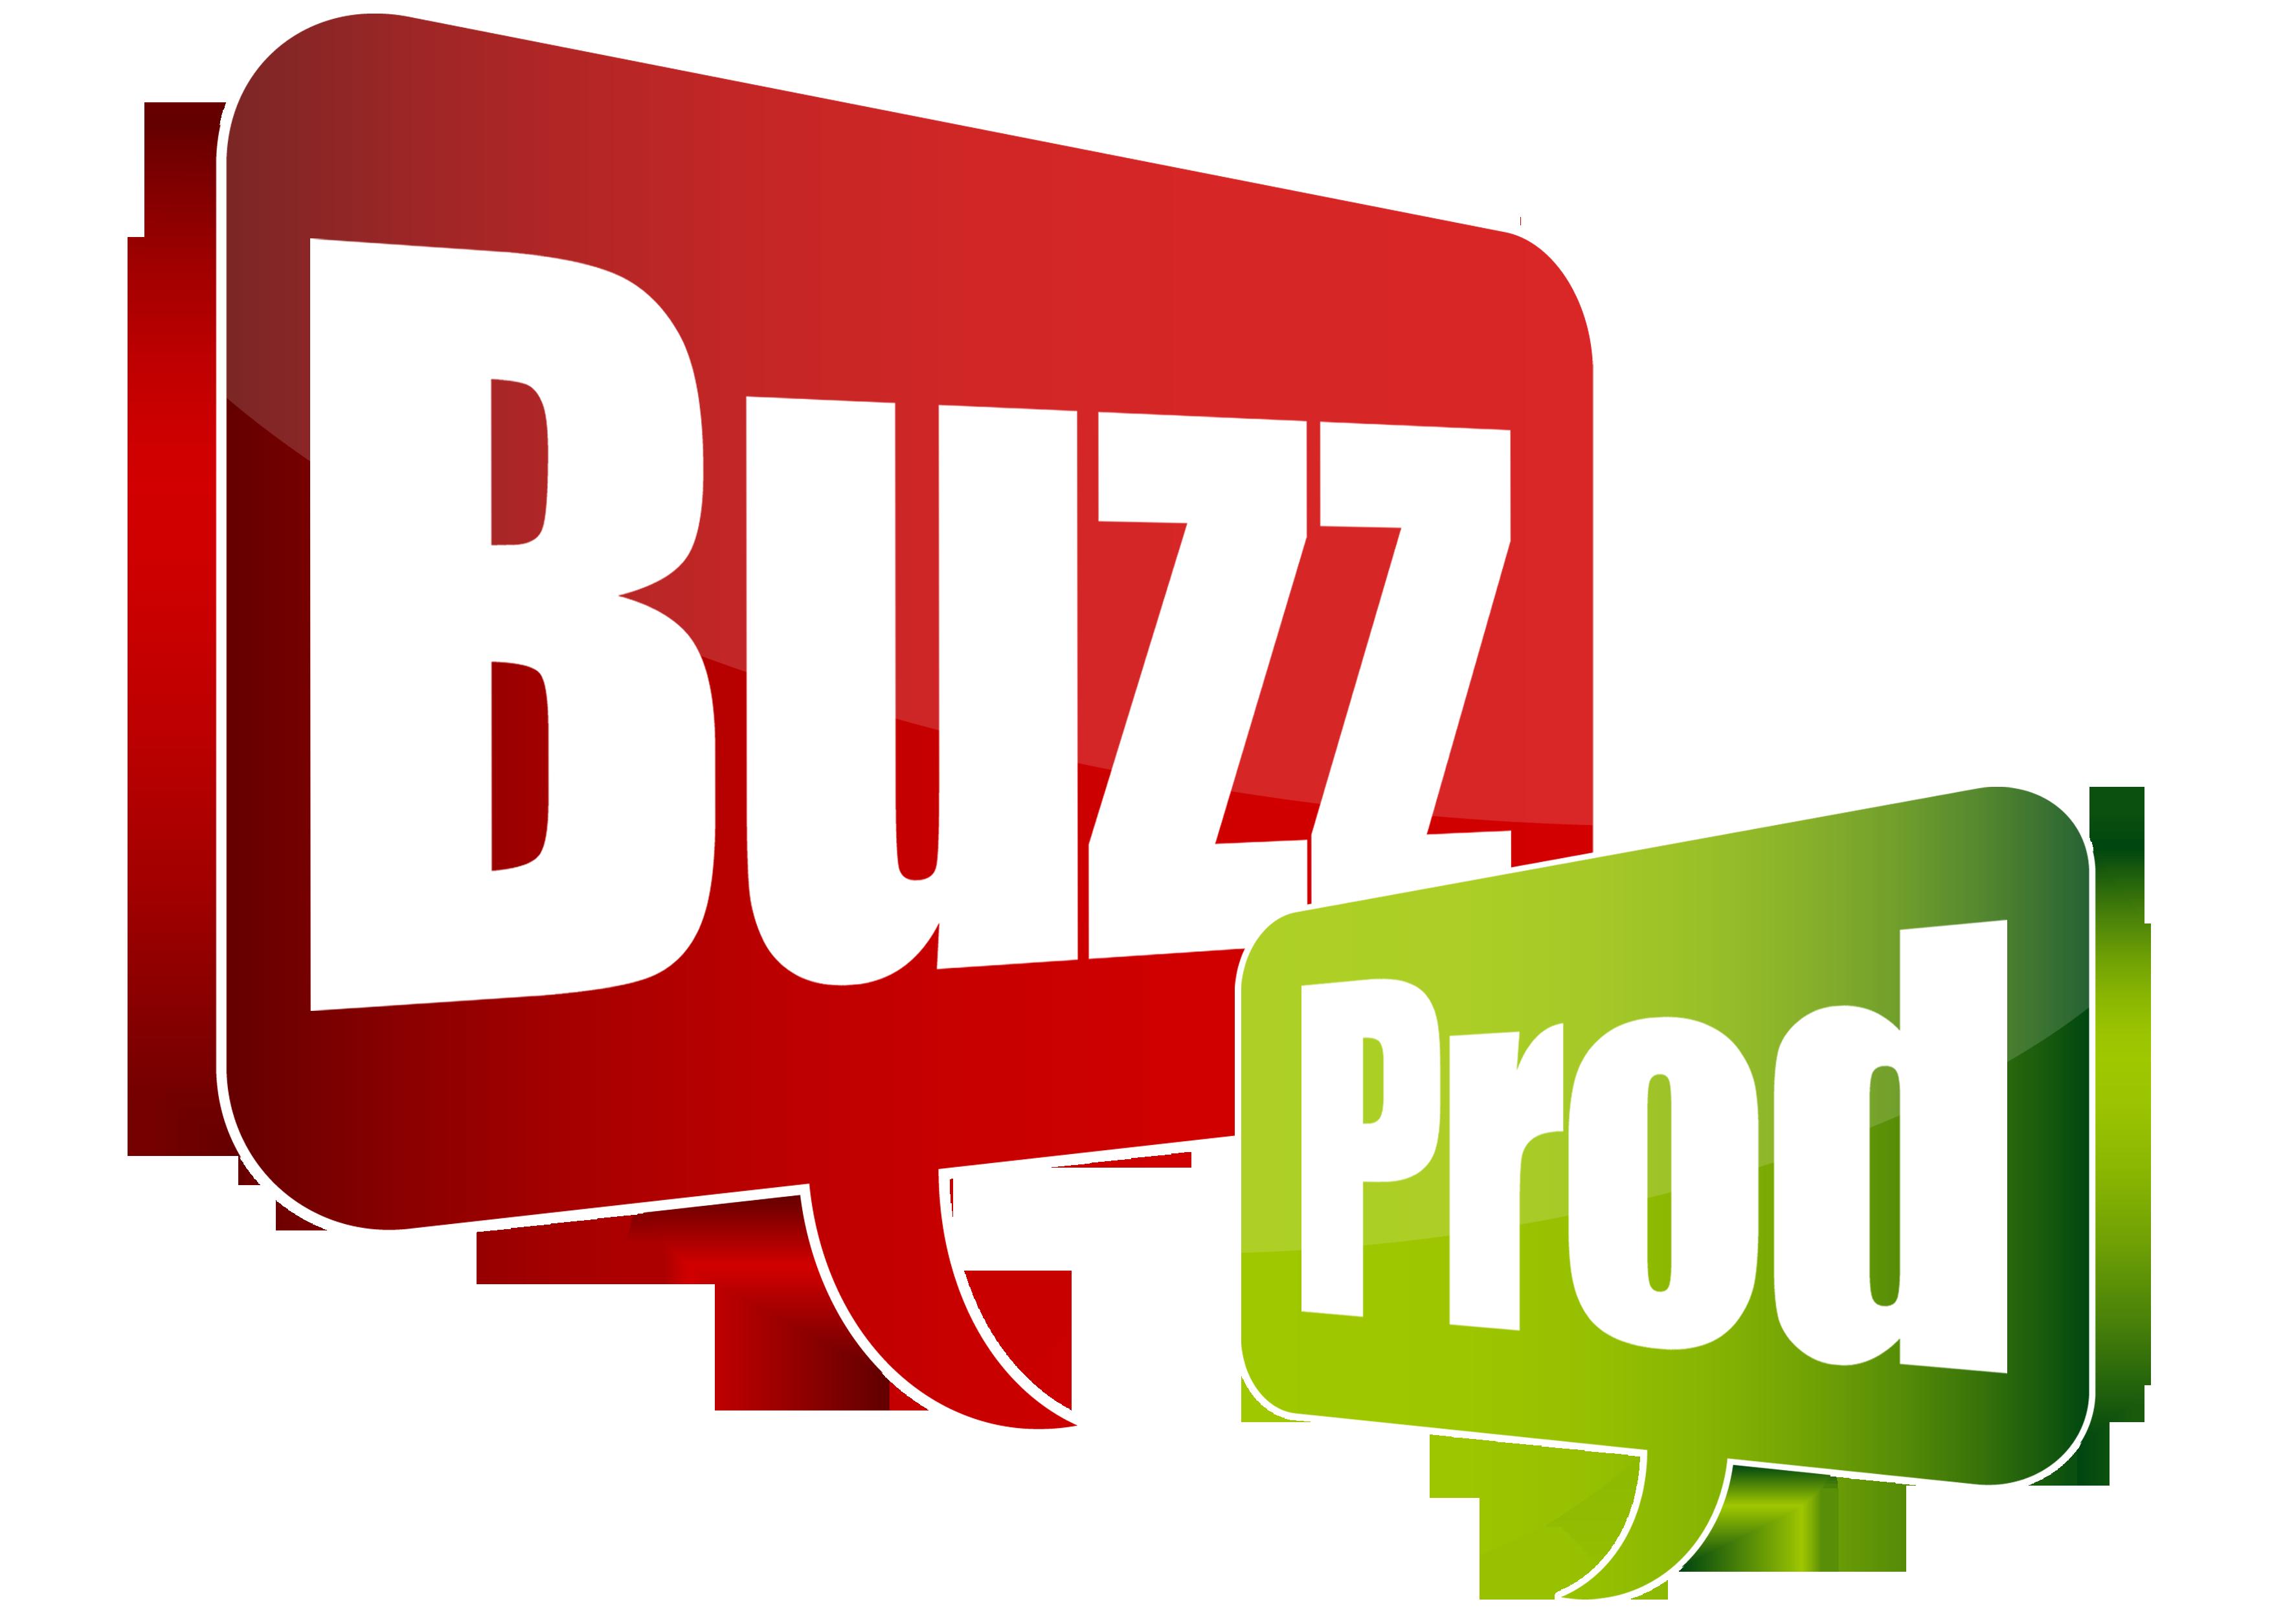 dj en savoie quiz blind test avec buzzers rh ne alpes buzzprod. Black Bedroom Furniture Sets. Home Design Ideas